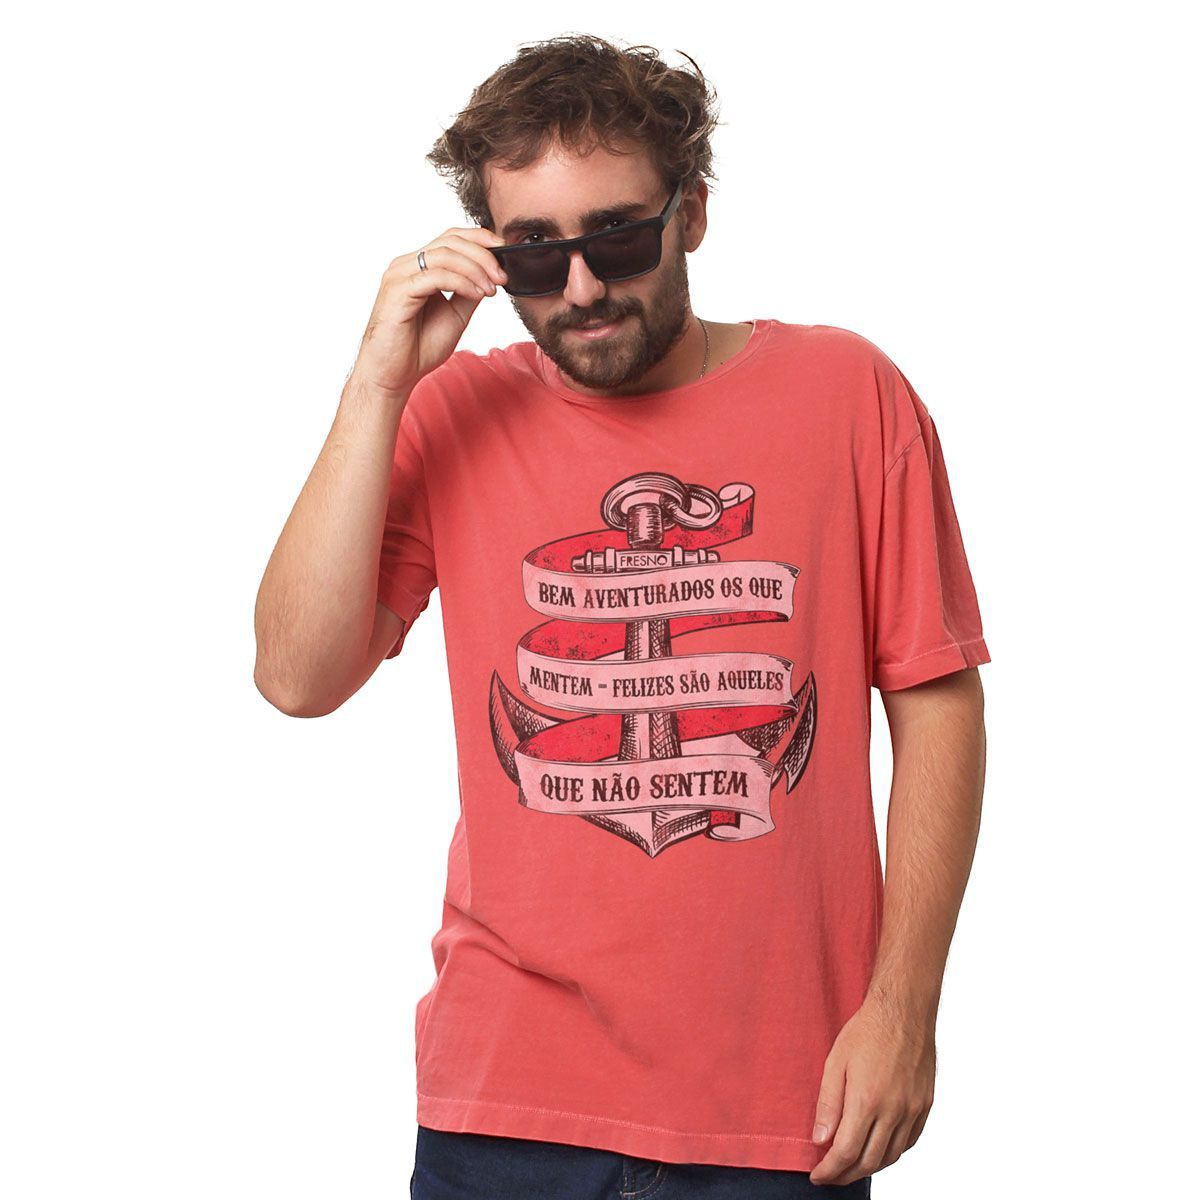 T-shirt Premium Masculina Fresno Bem Aventurados os Que Mentem  - bandUP Store Marketplace